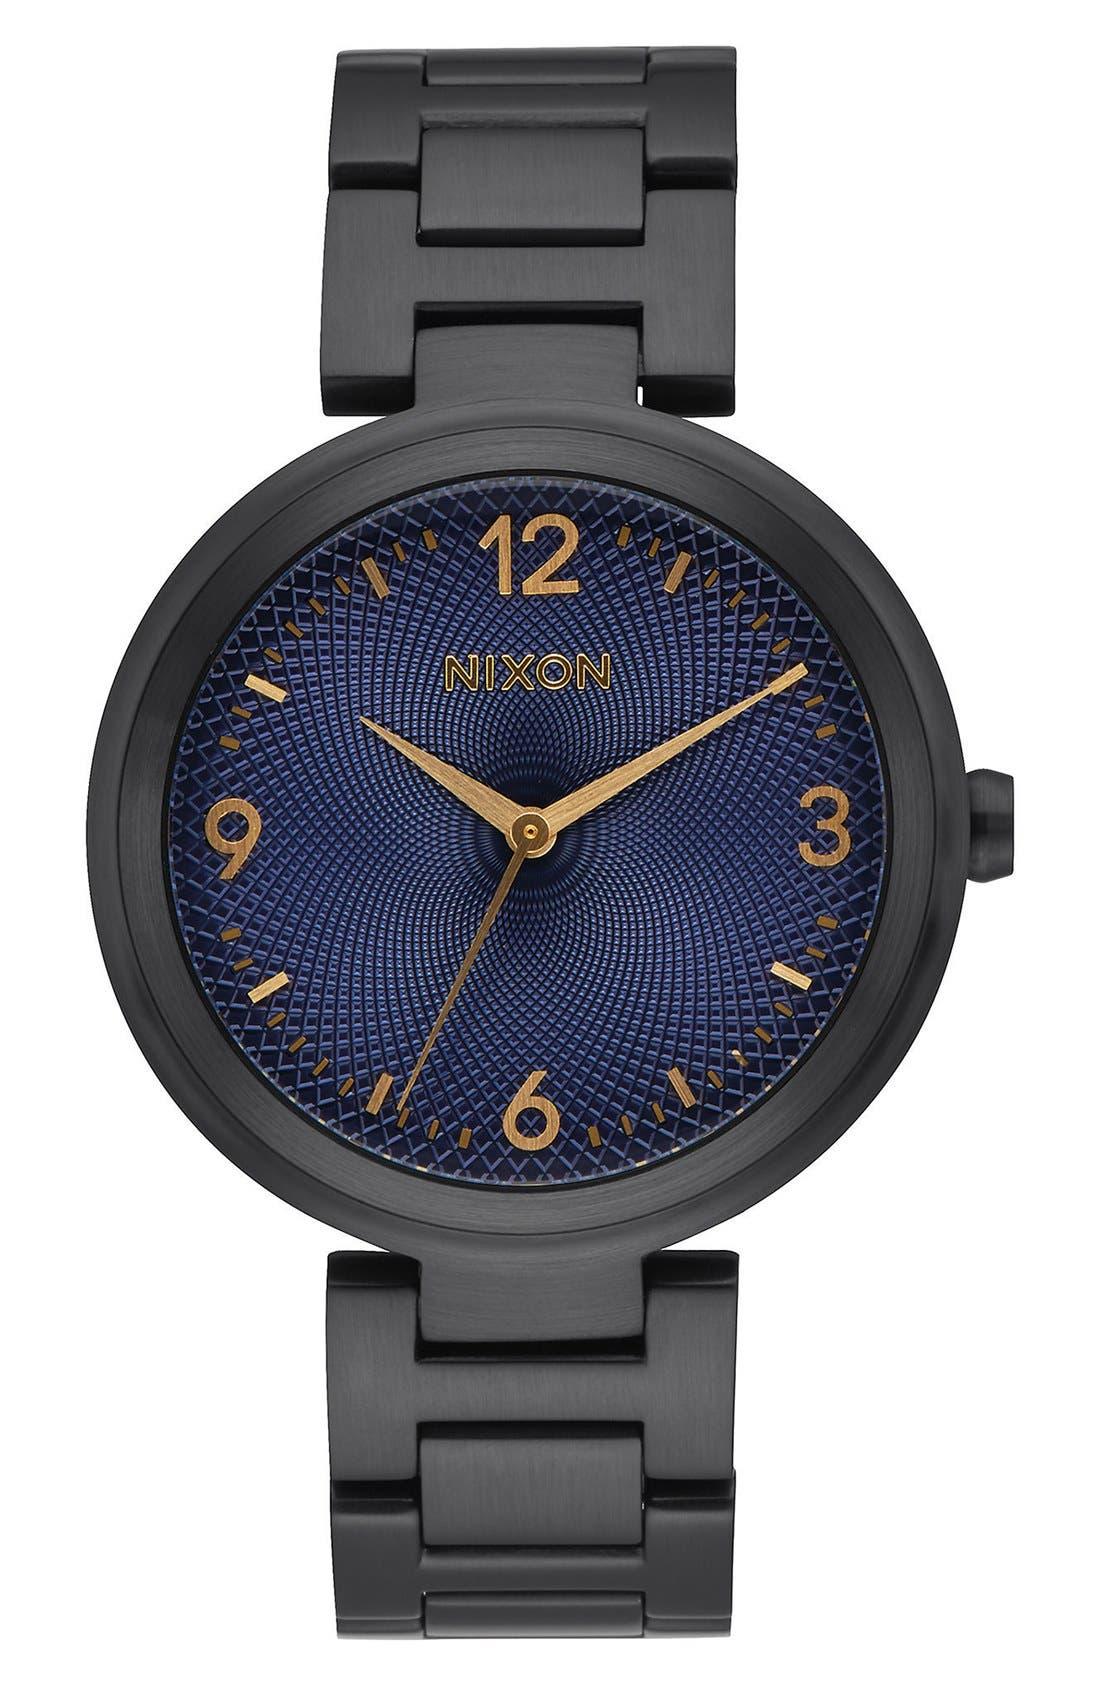 Alternate Image 1 Selected - Nixon 'Chameleon' Bracelet Watch, 39mm